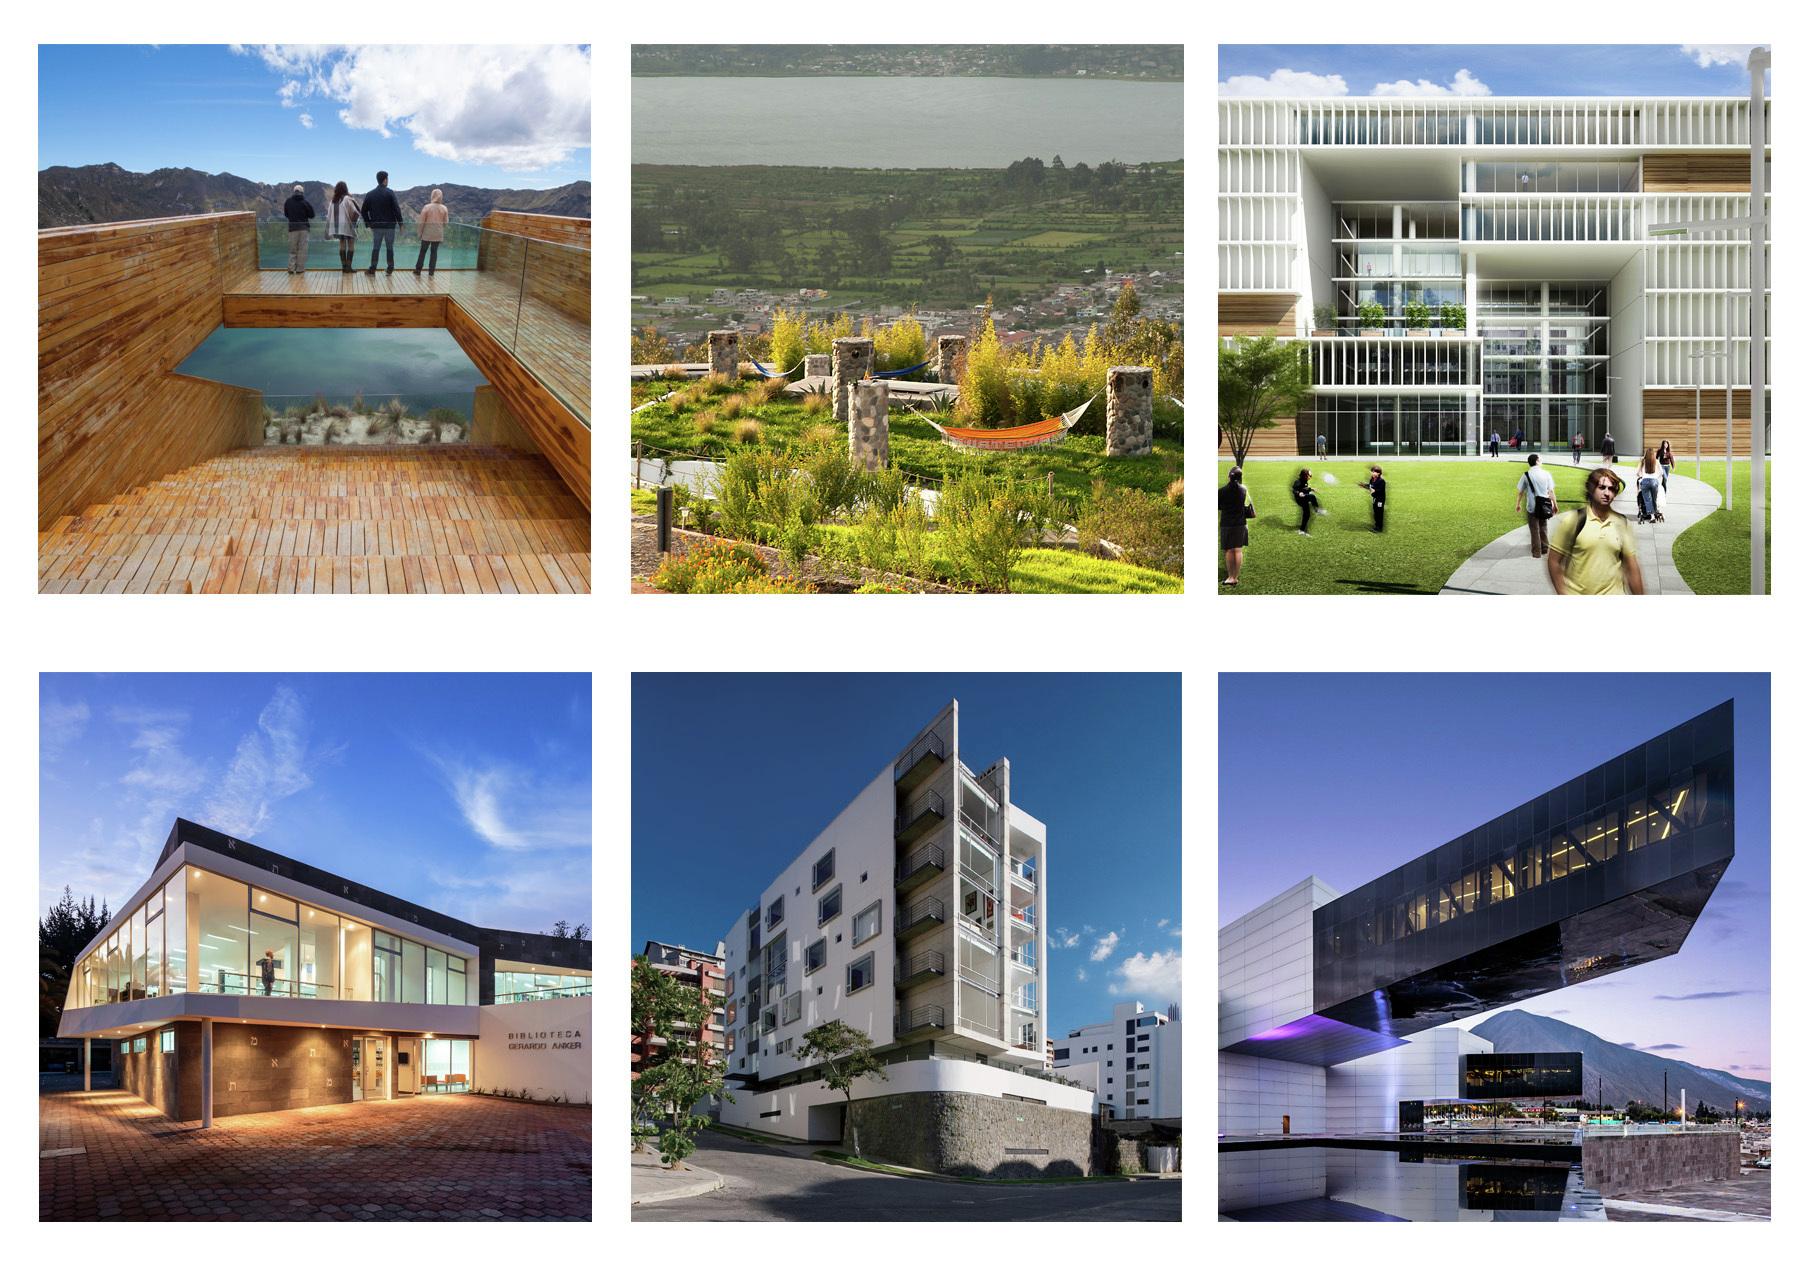 Arquitectura contempor nea de ecuador 1999 2015 el for Arquitectura de proyectos